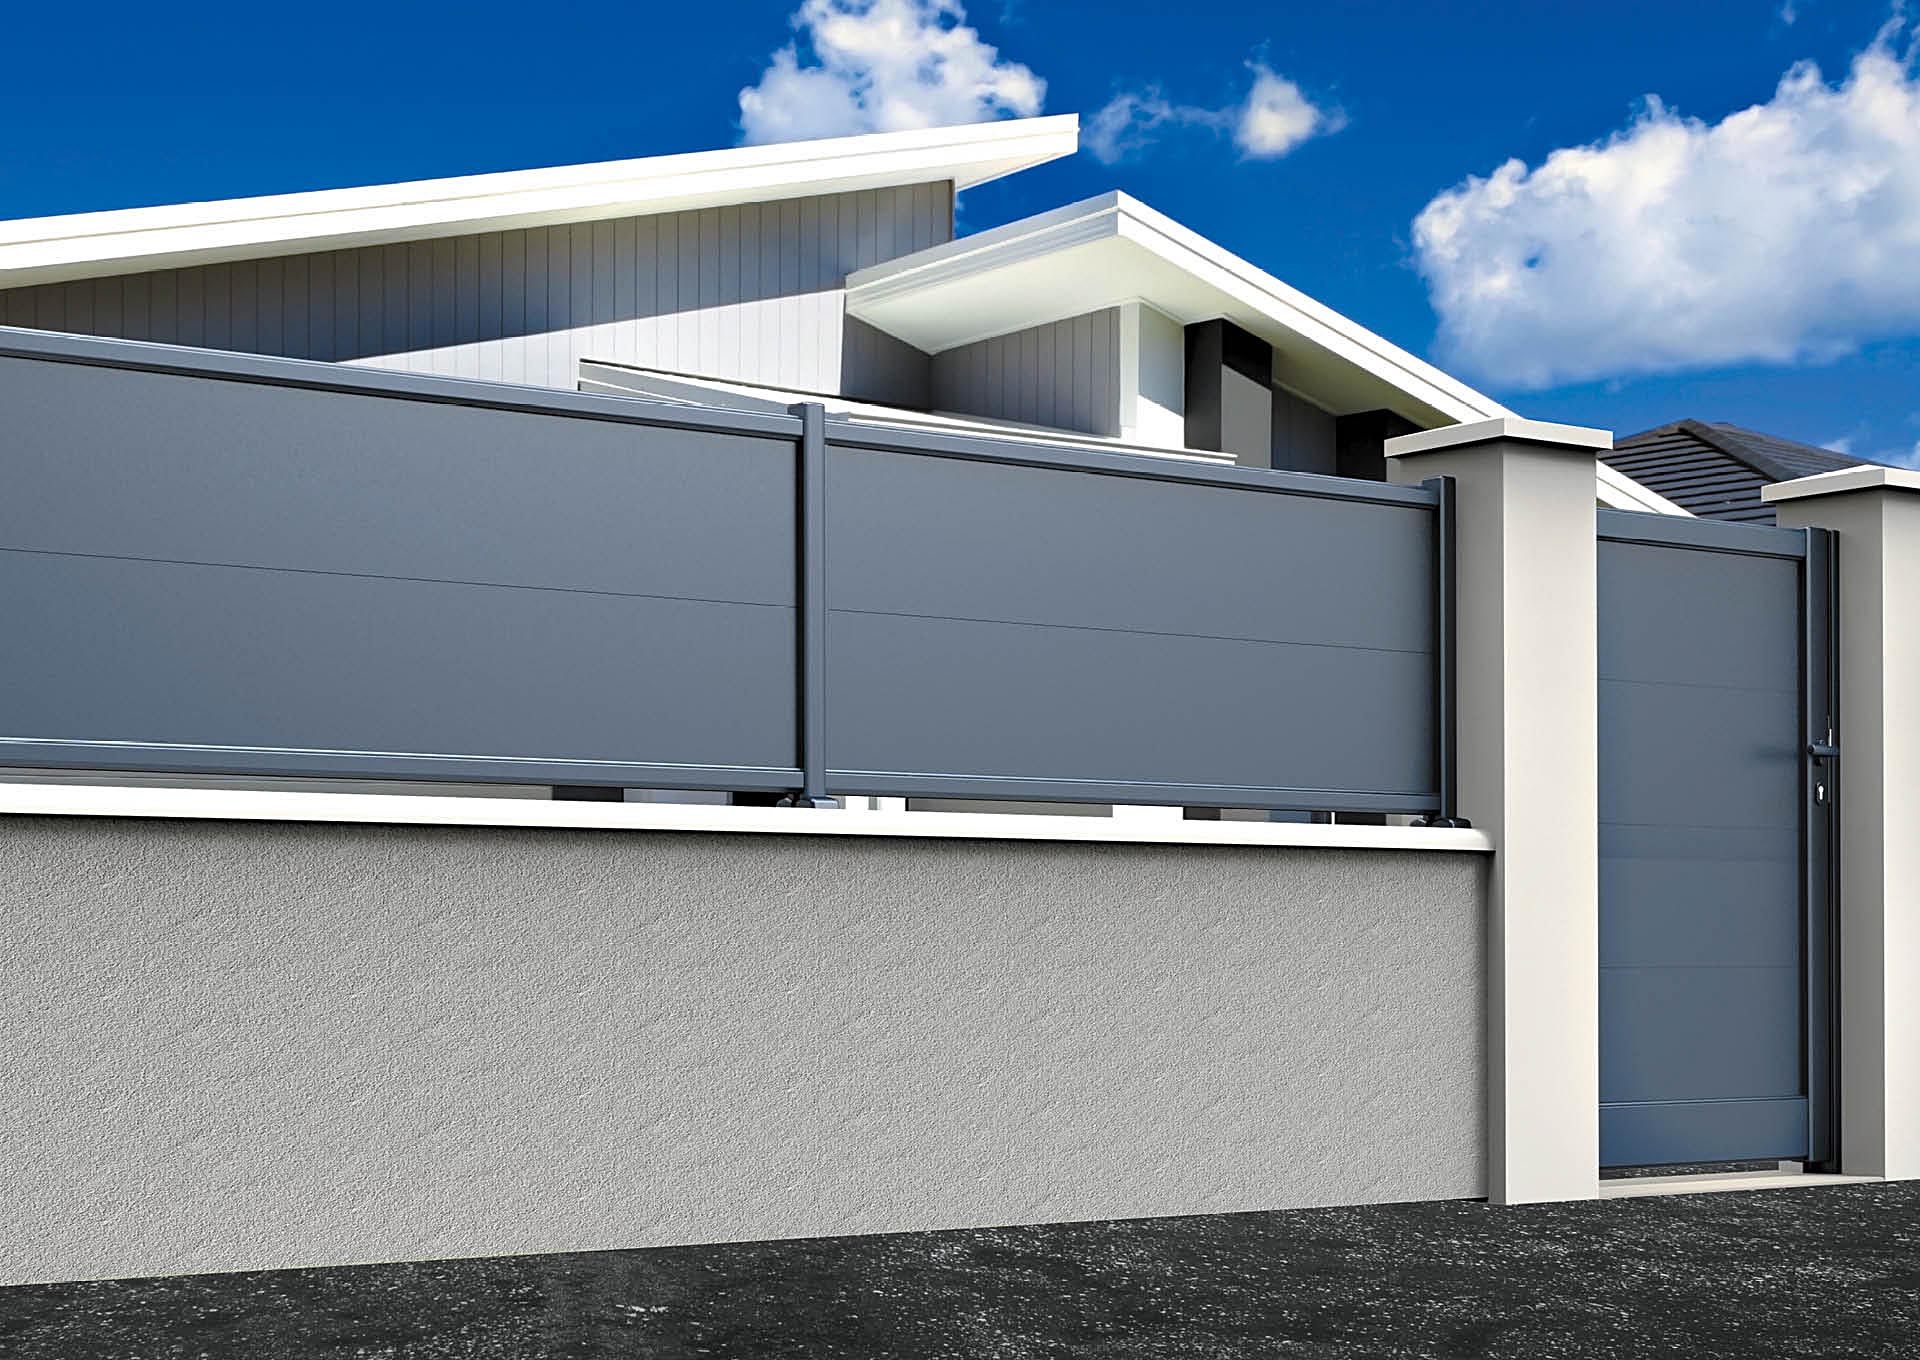 Clôtures aluminium lames horizontales 340 mm